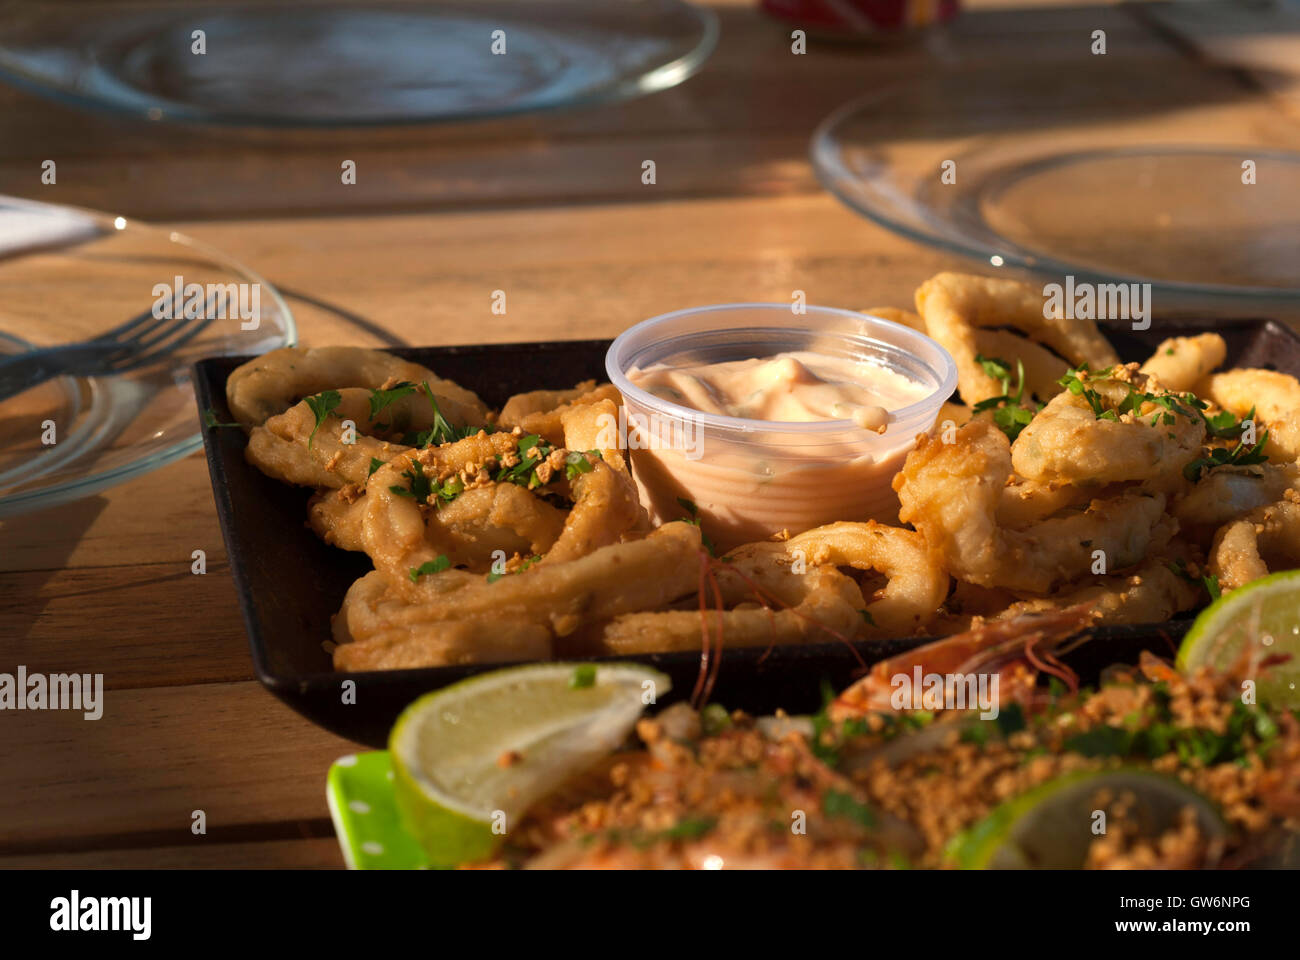 Street Food Rio De Janeiro Stock Photo 118777416 Alamy